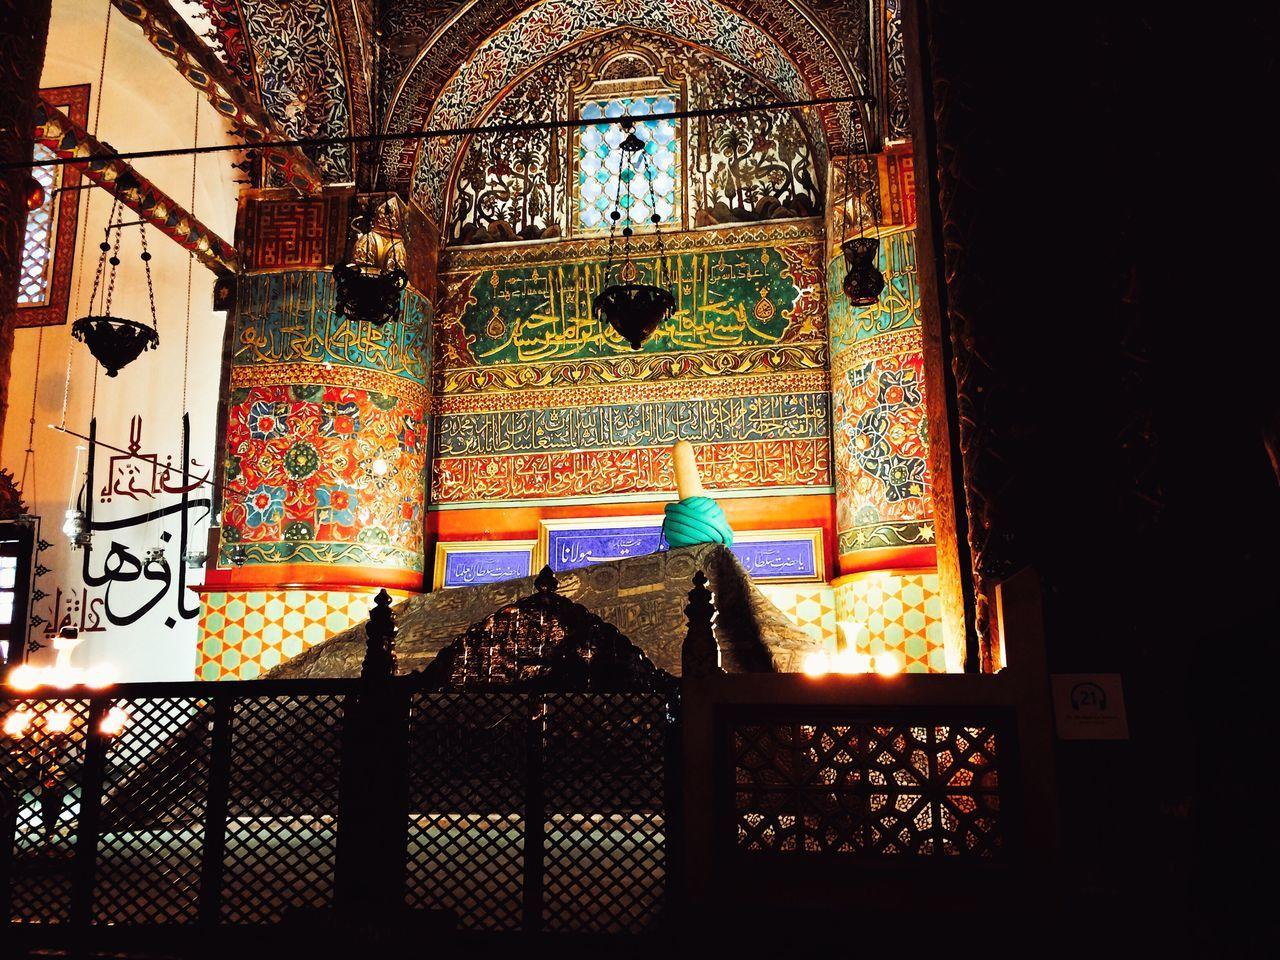 History Elégance Vintage Love ♥ Mevlana Türbesi Mevlana Mosque Konya Turkey Arts Culture And Entertainment Konya Turkey Retro No People Mosque